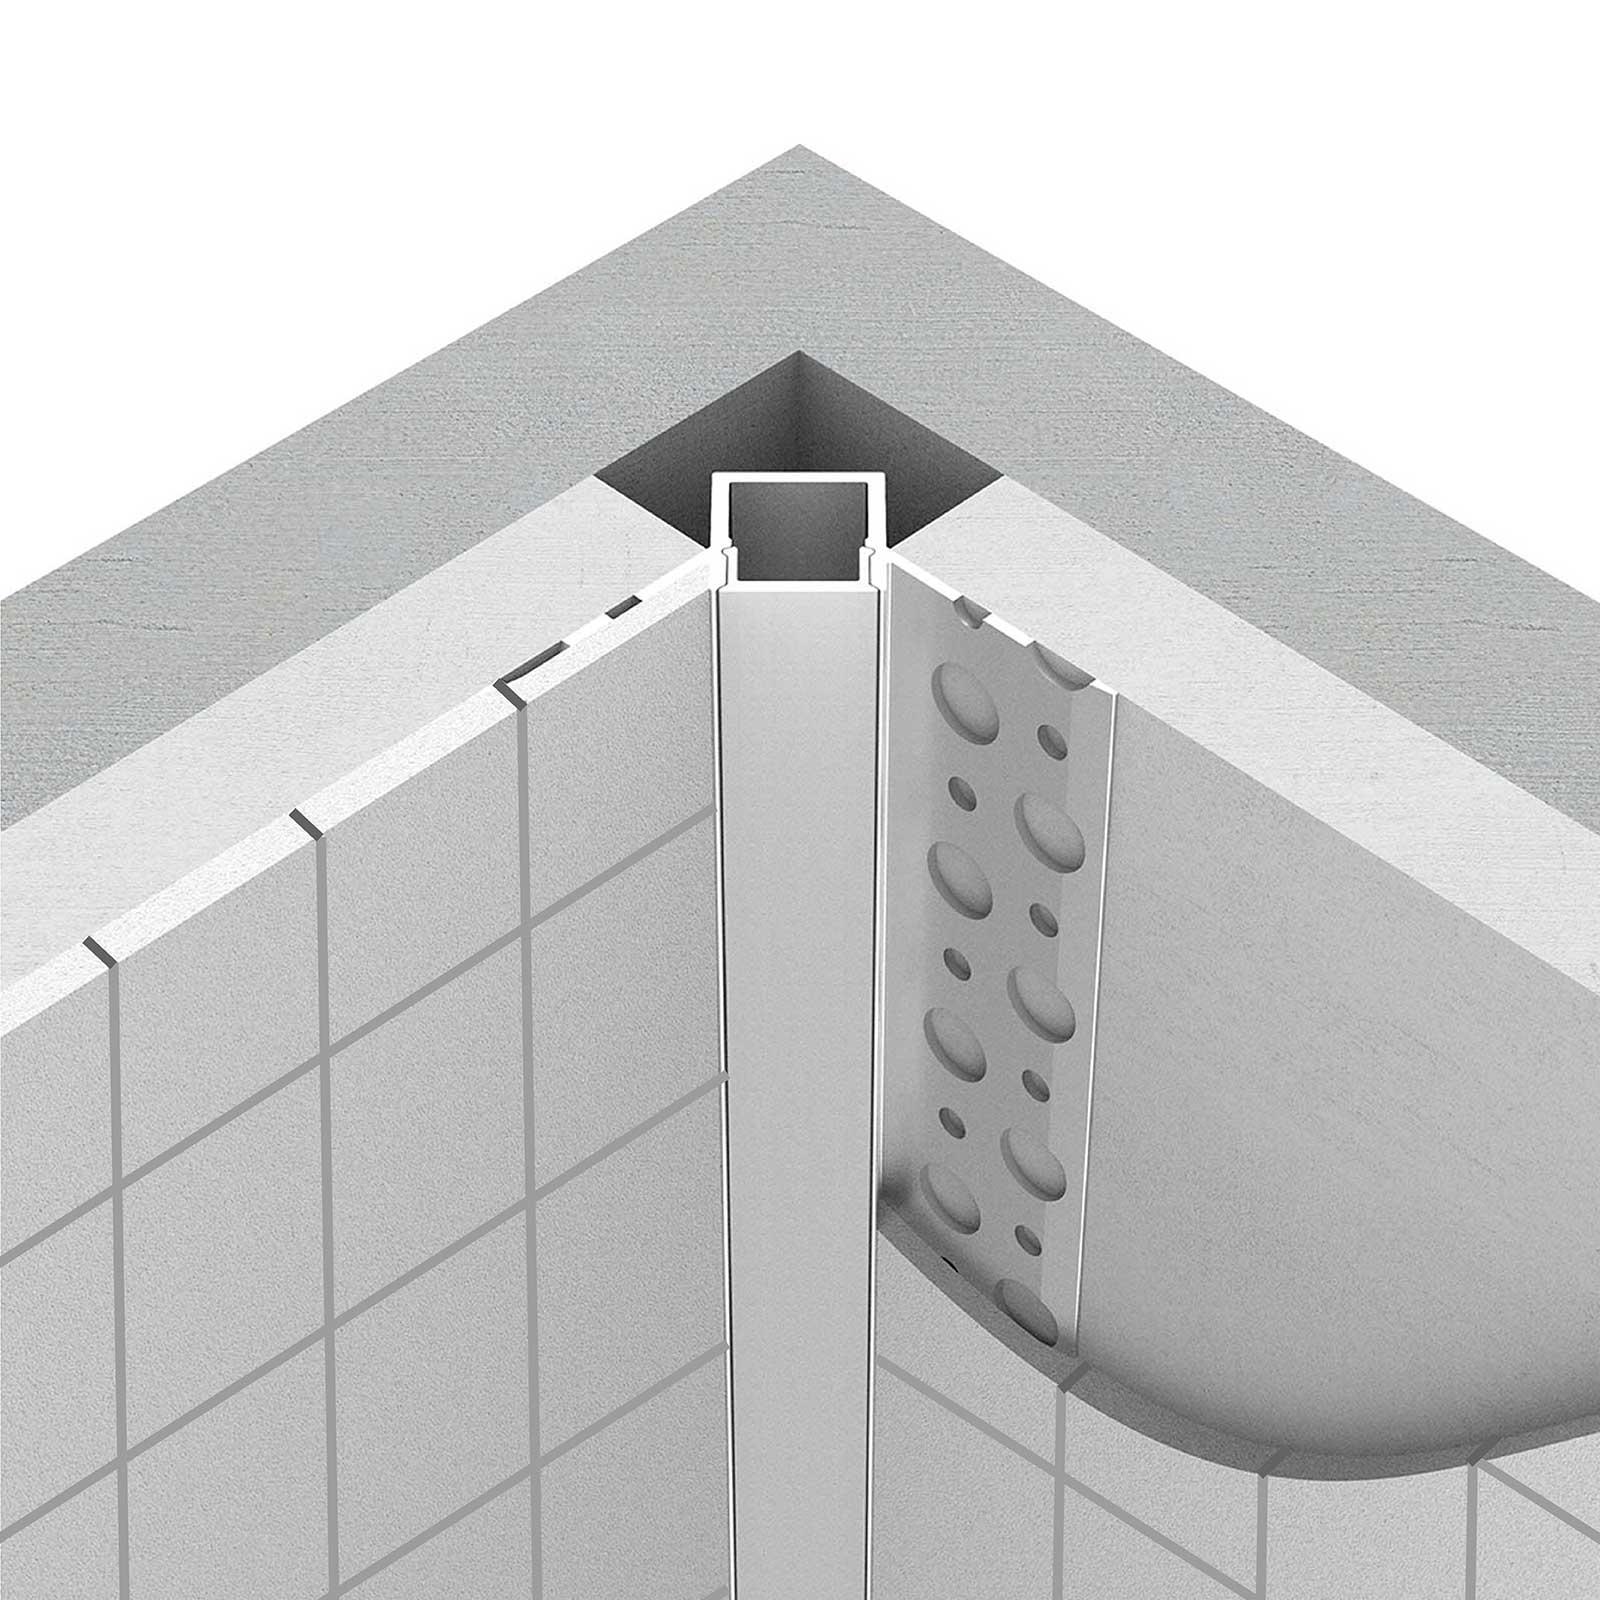 Montage 2 Meter LED Inneneck-Aluprofil TARA (TA) für Trockenbau Rigipswand Fliesenspigel